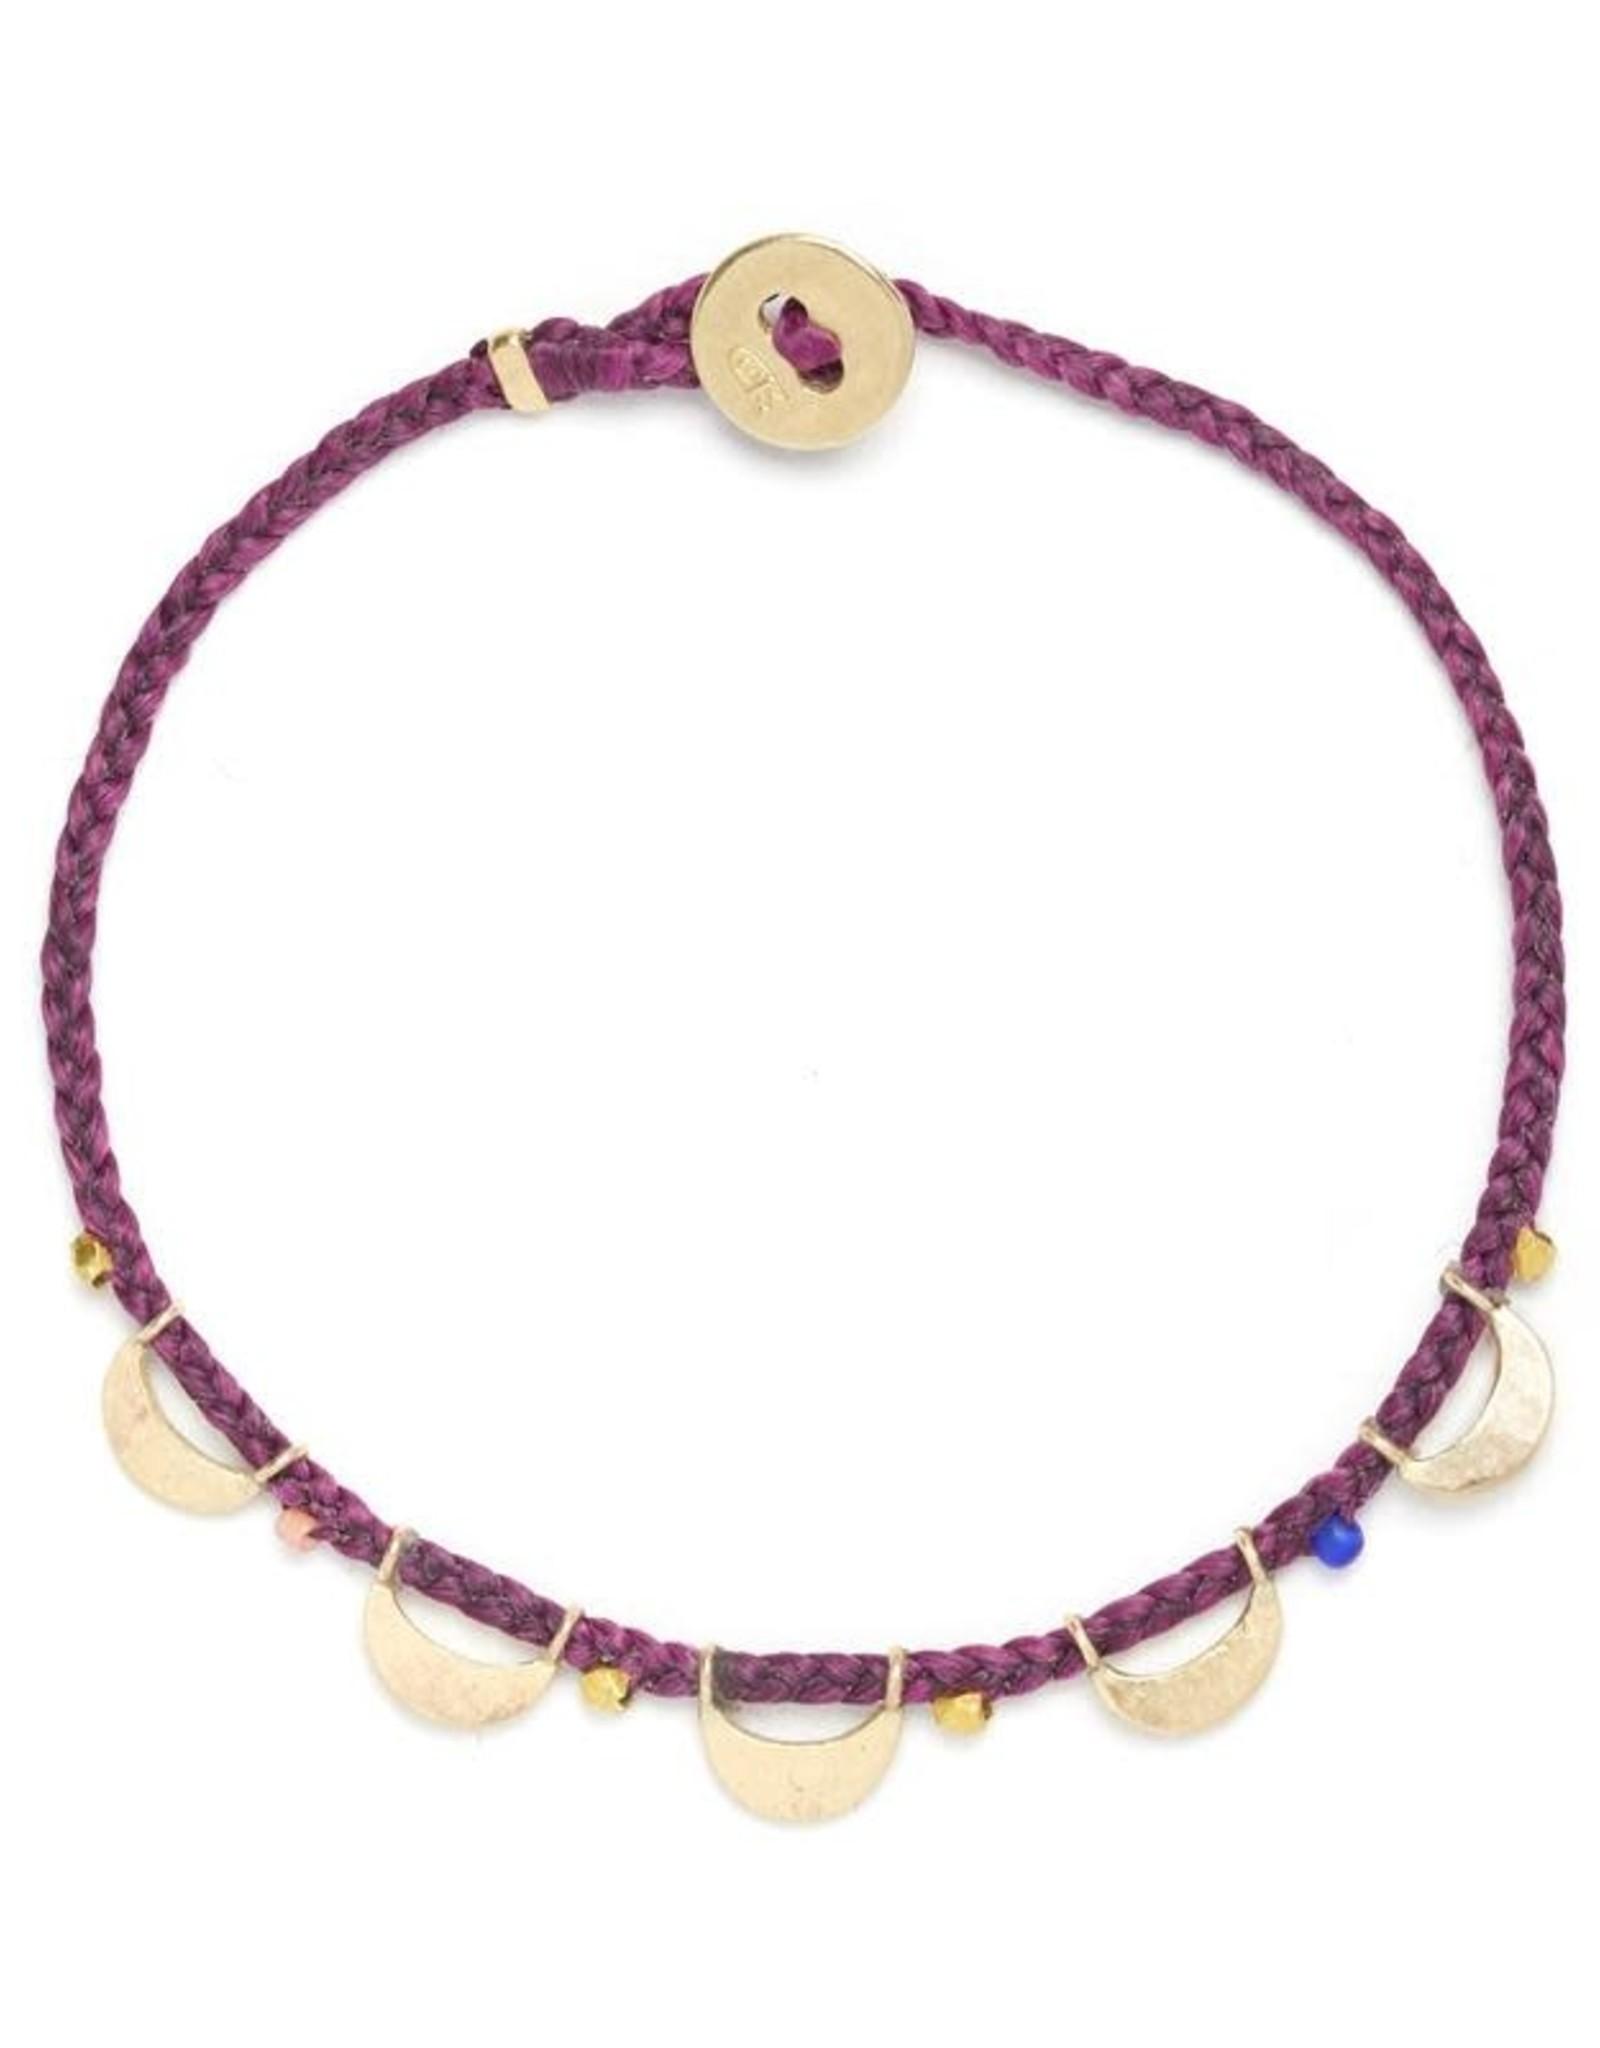 Scosha Luna Caravan Vermeil Bracelet - Plum